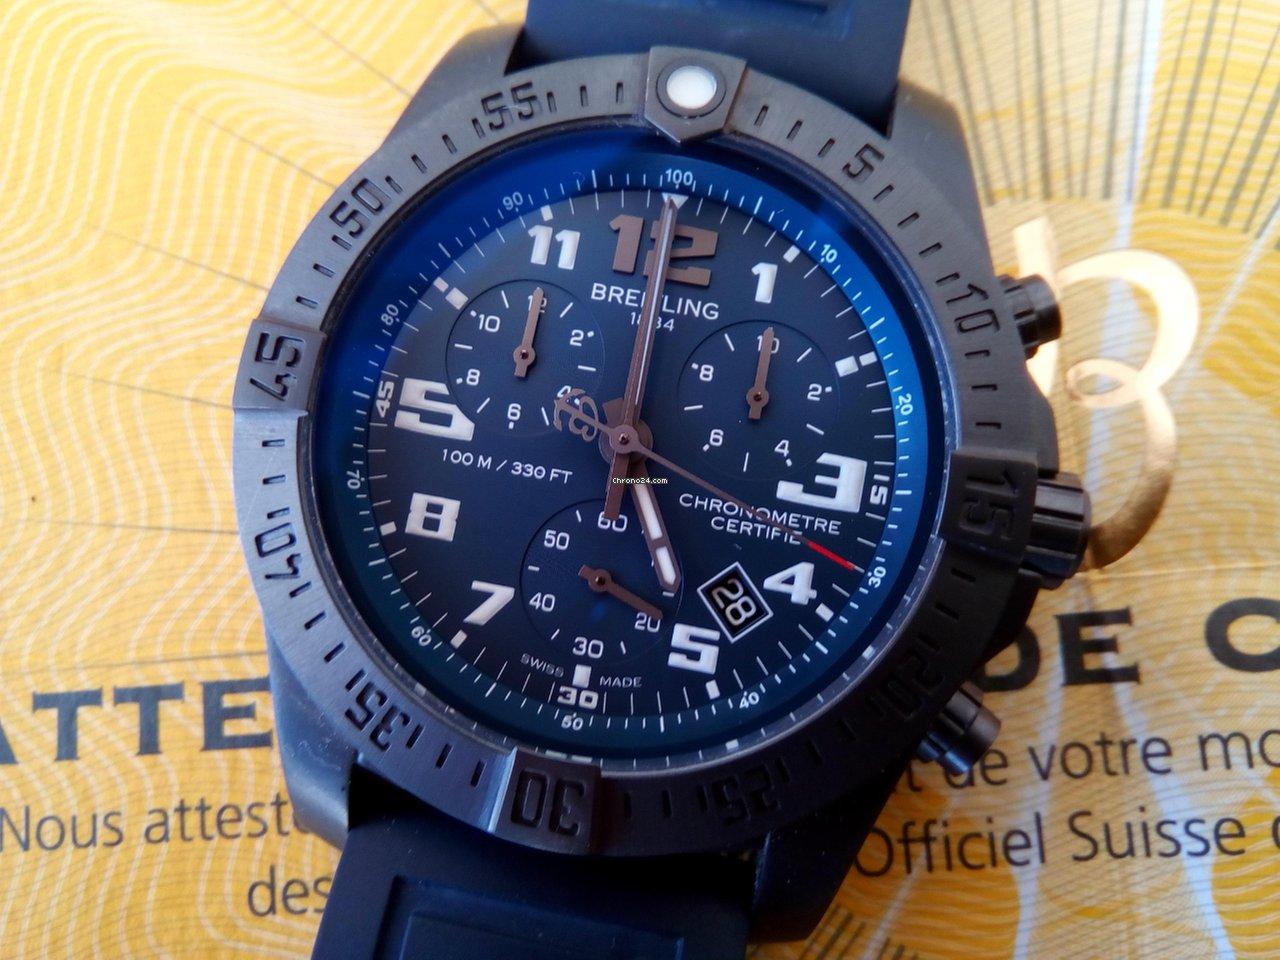 d9a781eced41 Comprar relojes de bolsillo al mejor precio en Chrono24